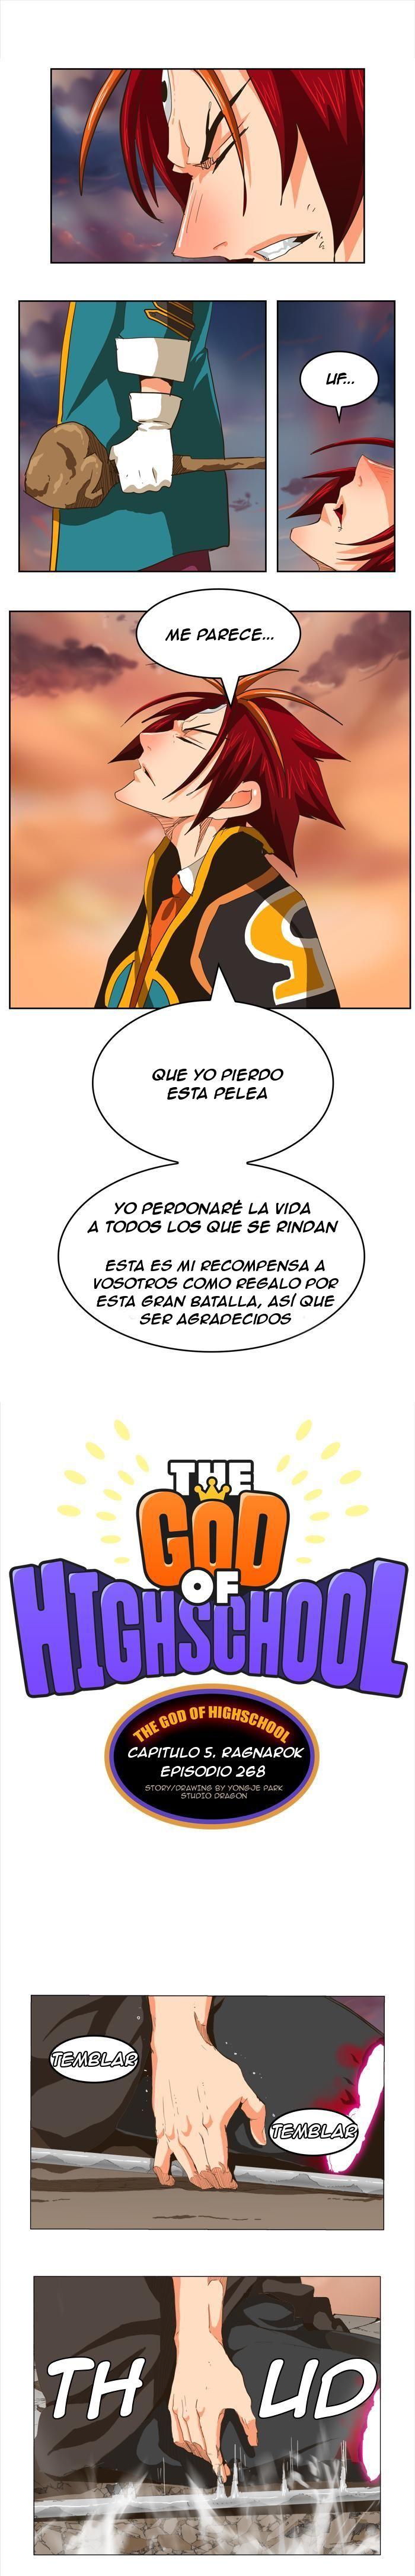 http://c5.ninemanga.com/es_manga/37/485/485984/c5de923f1e4f4b9f4d0546b22e91586f.jpg Page 2